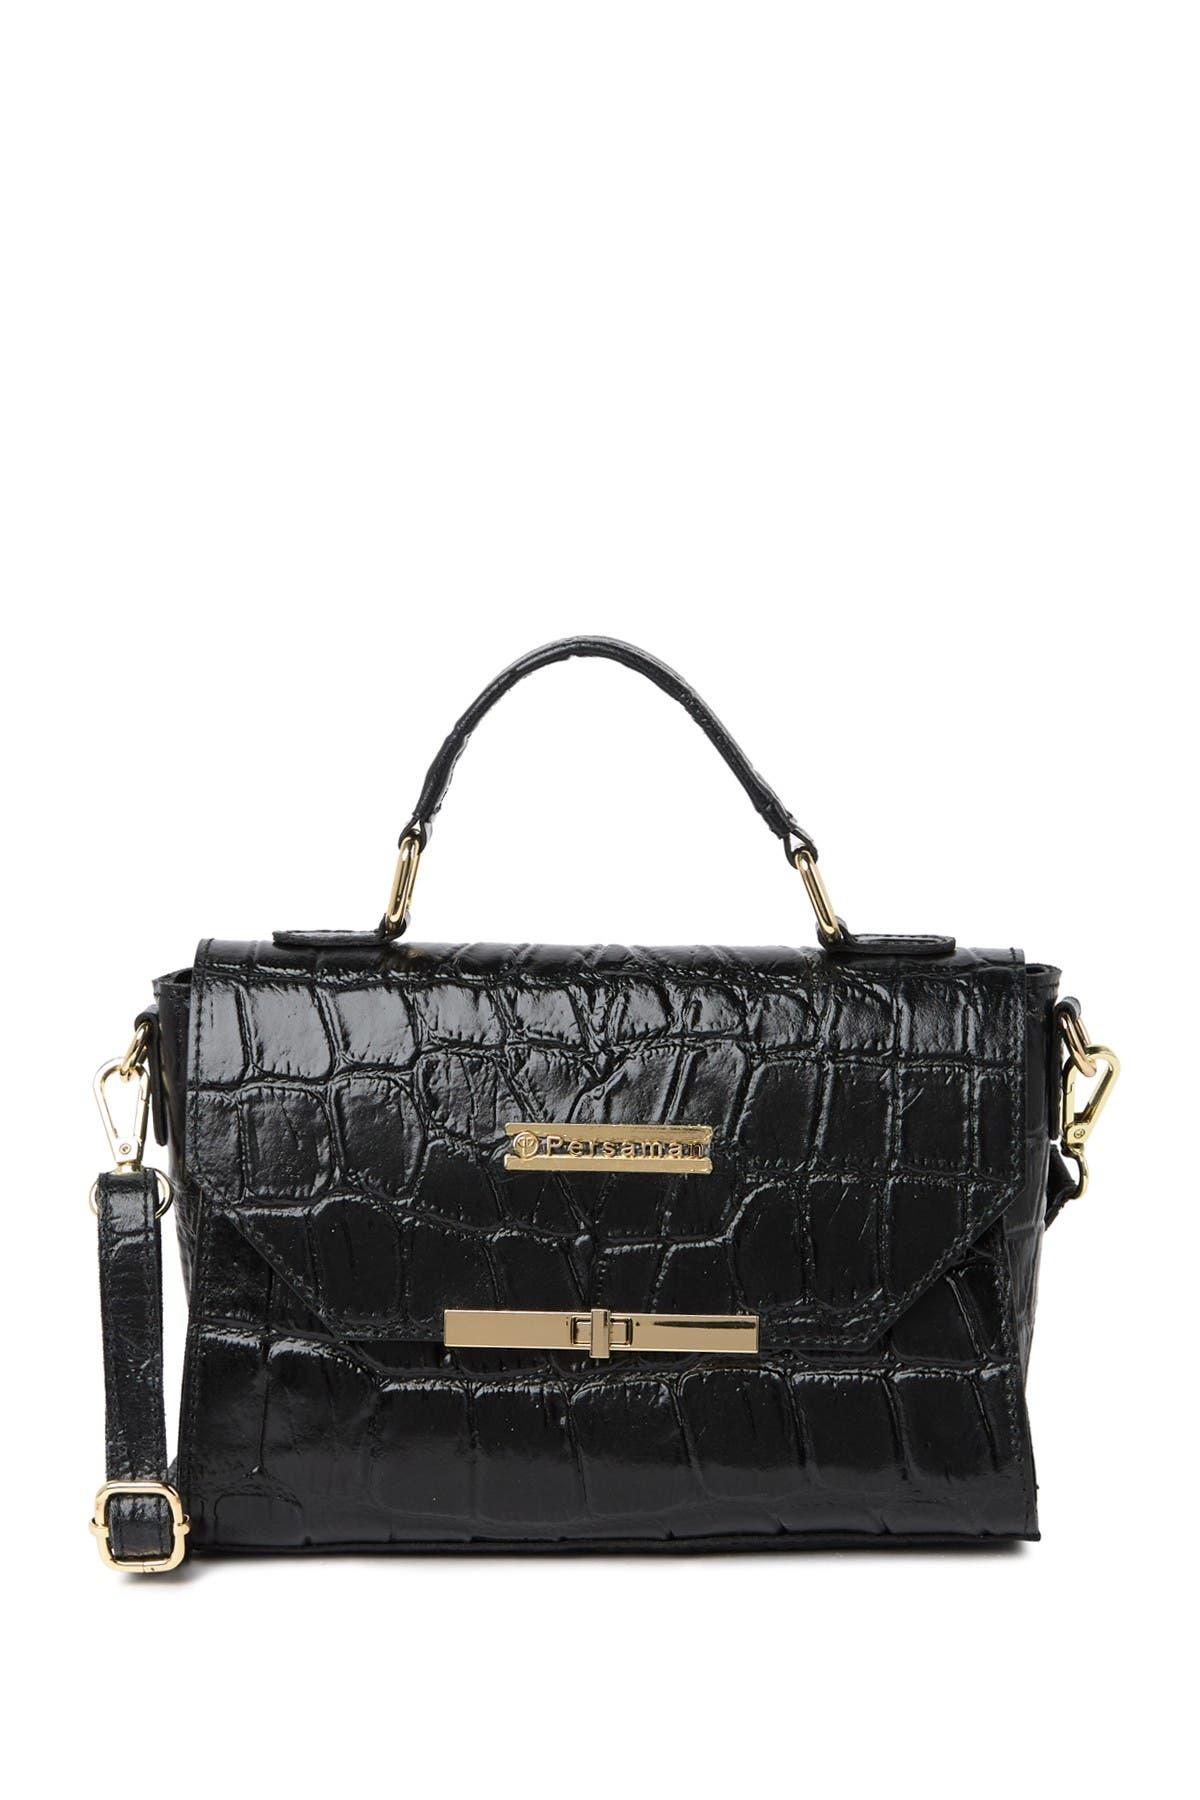 Image of Persaman New York Valentine Embossed Leather Crossbody Bag